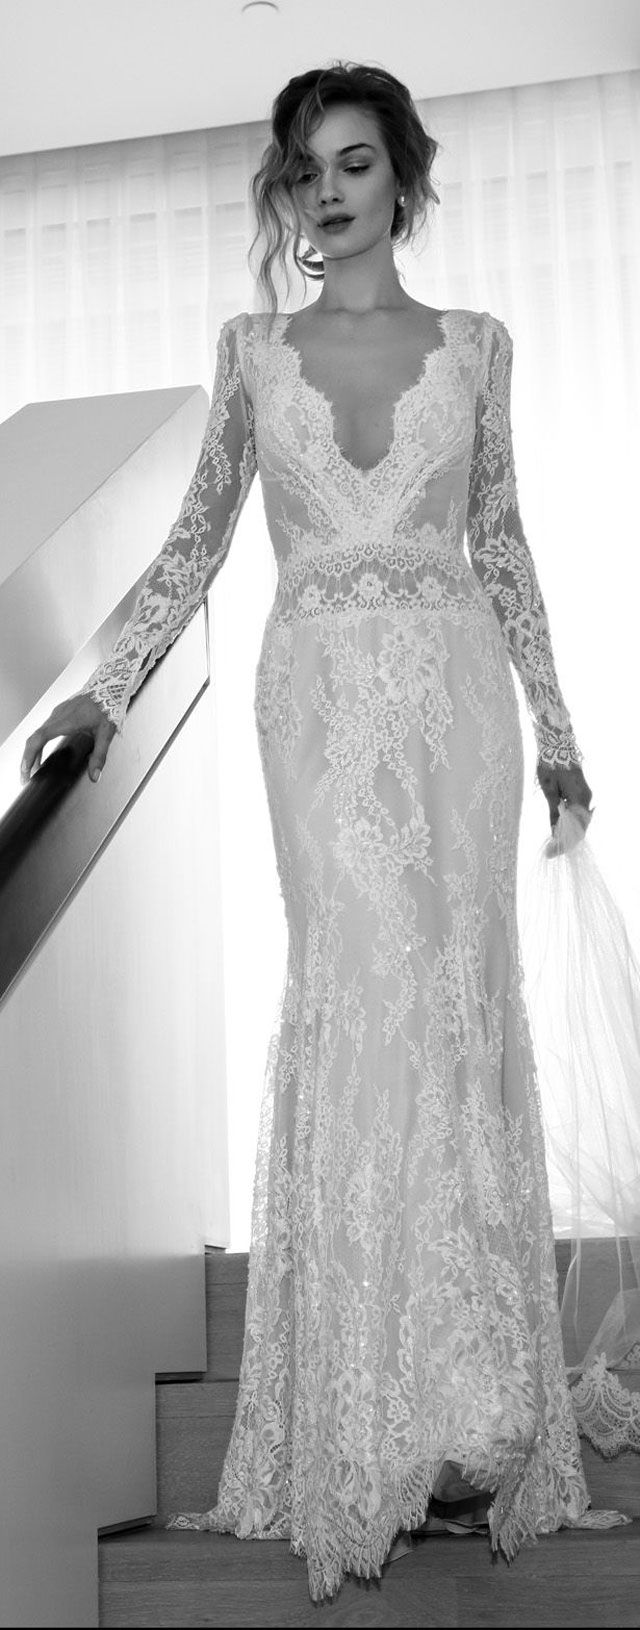 Hippie Wedding Dresses Cheap Plus Size 2015 Lihi Hod Sheath Modest Lace Wedding Dresses…